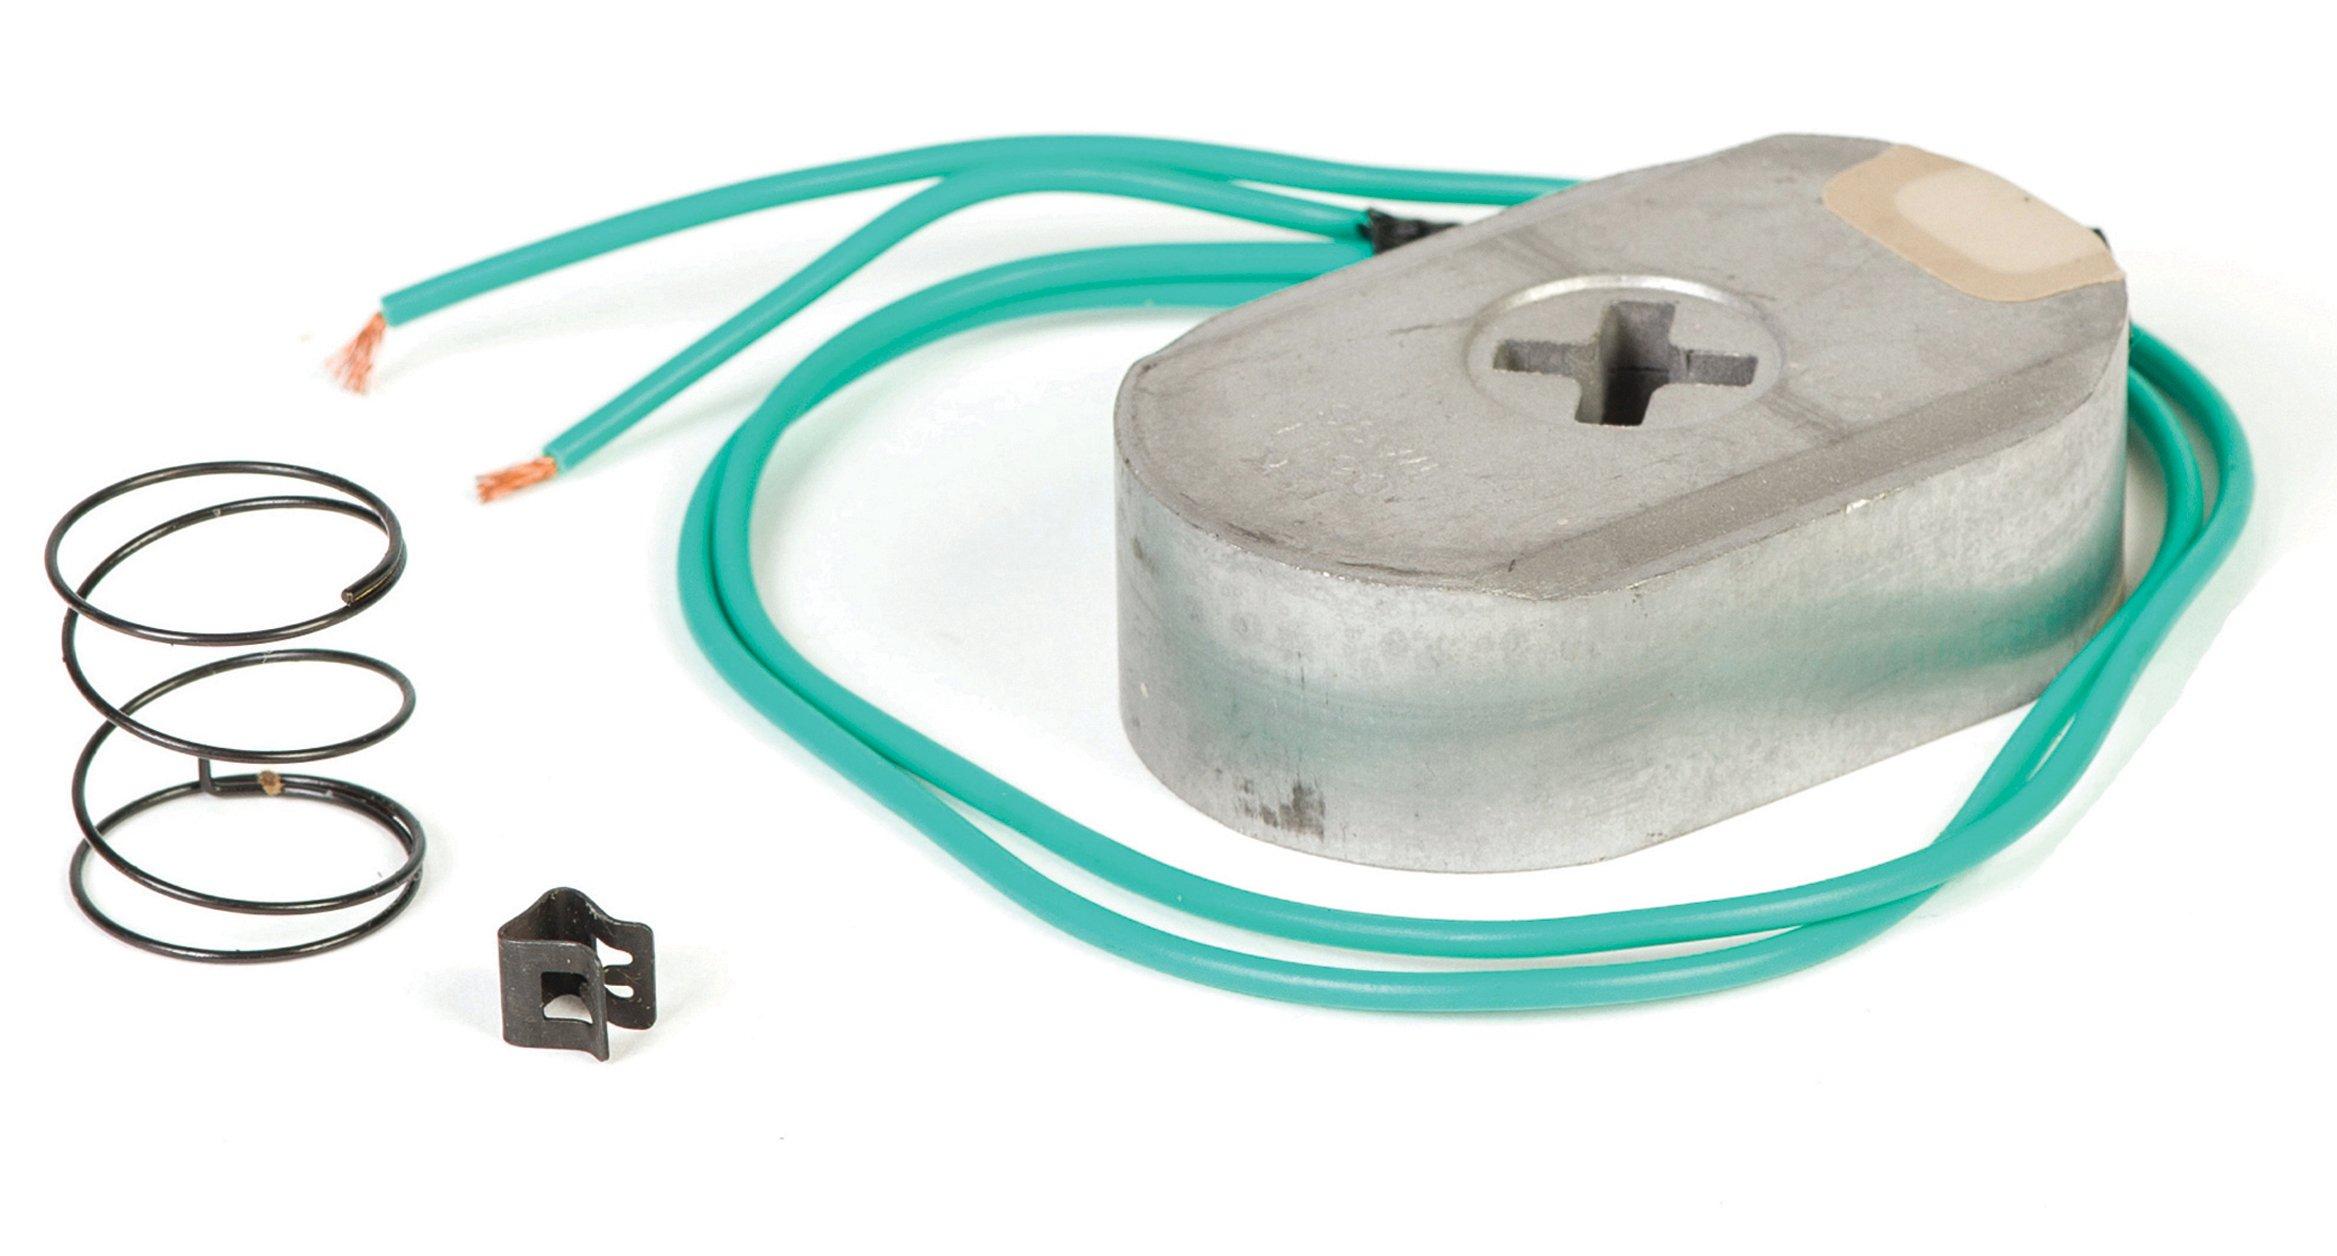 Husky 30818 10'' x 2.25'' Electric Brake Magnet Kit